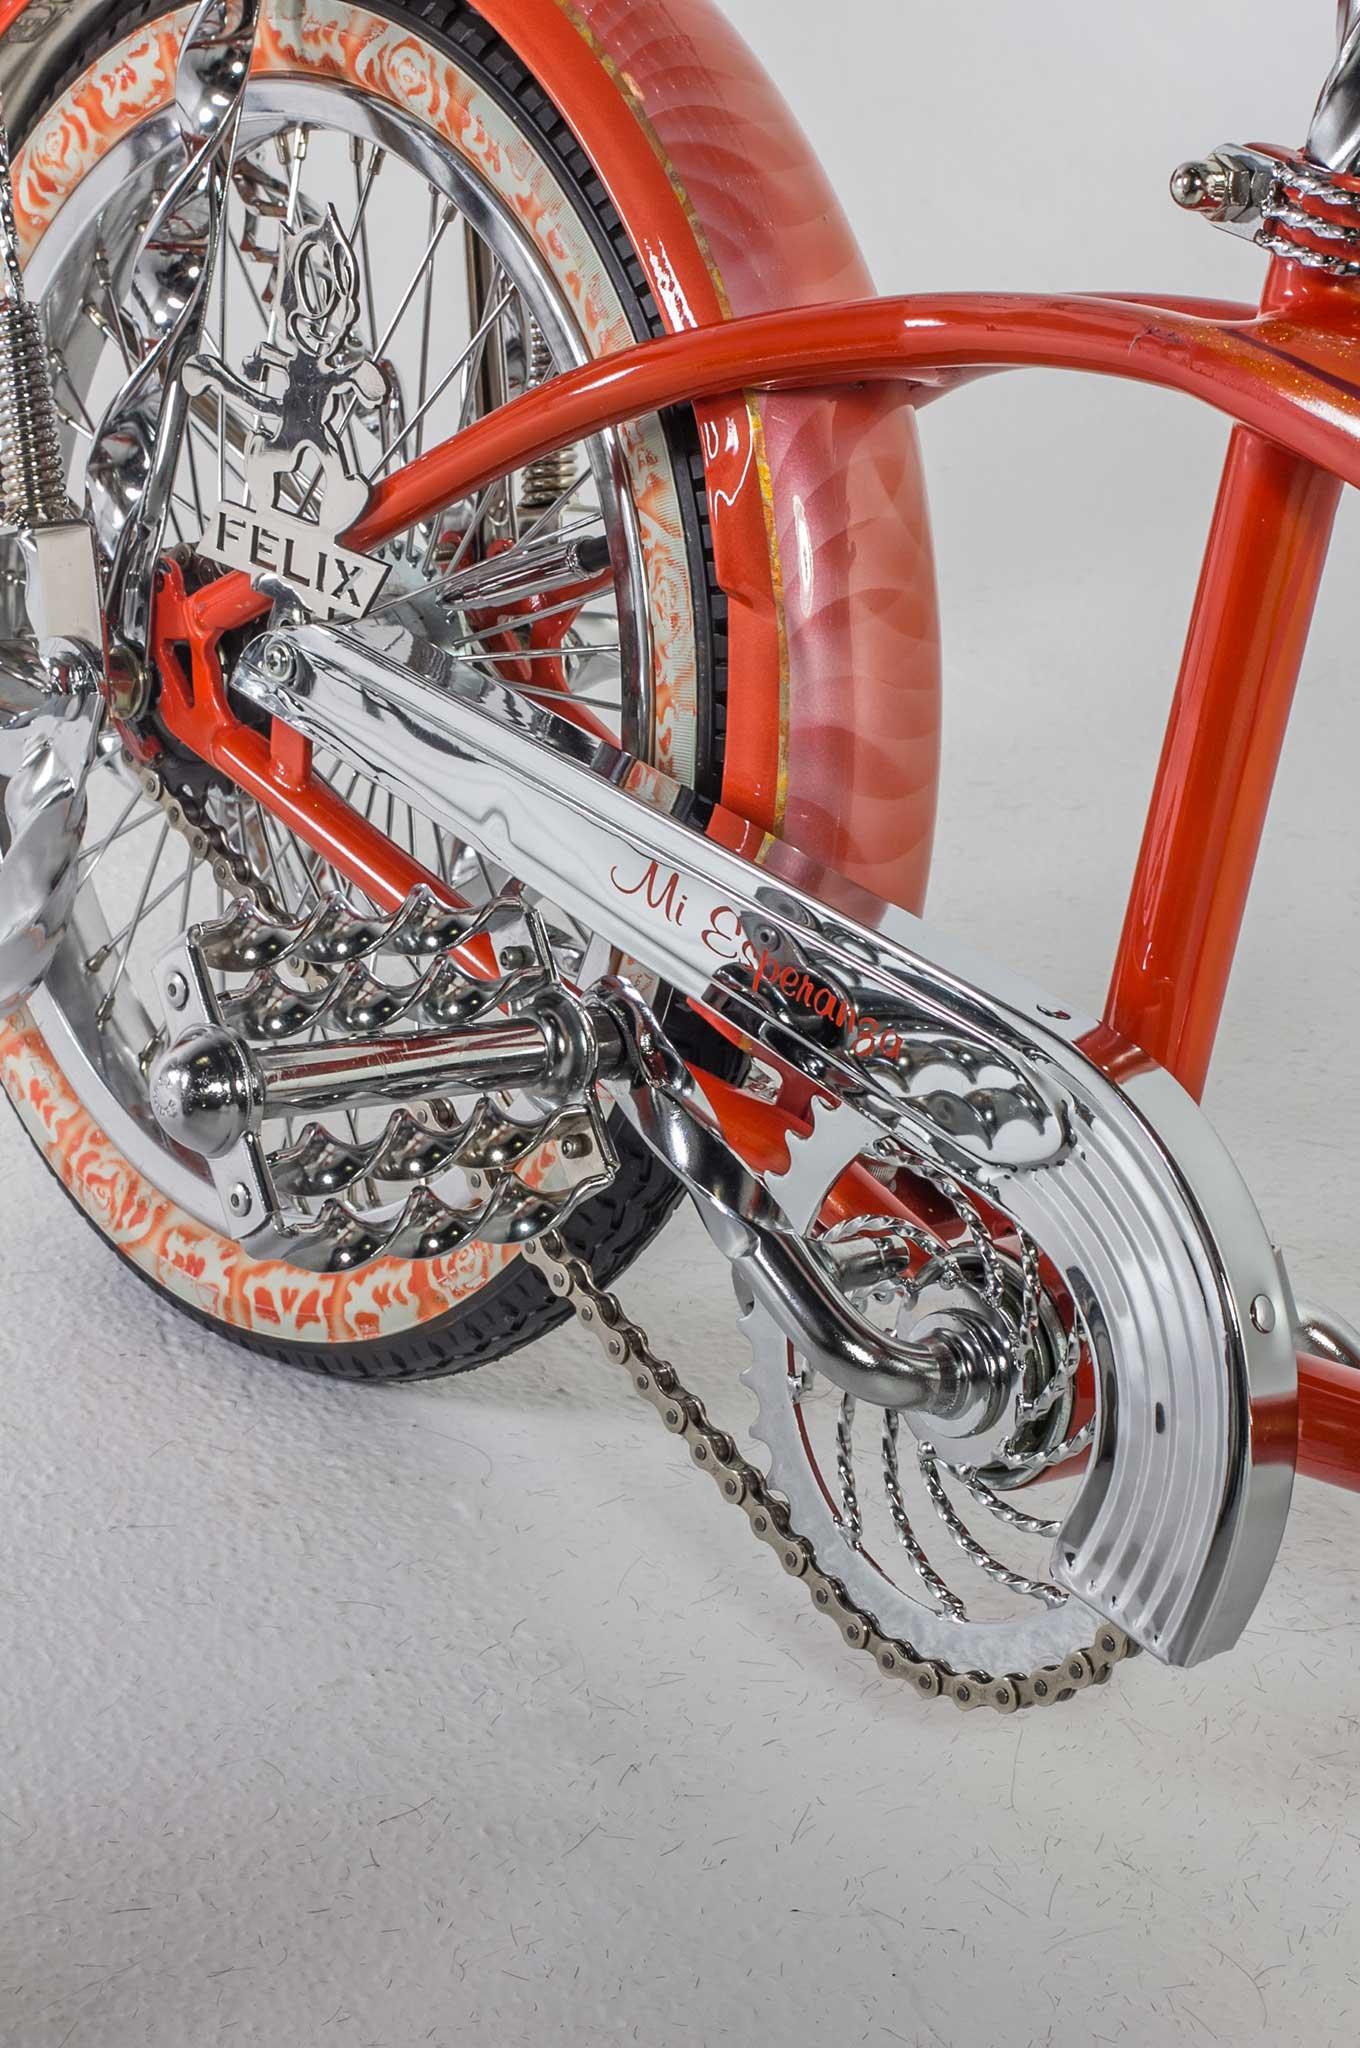 1996 16 Inch Lowrider Bike The Godfather Lowrider